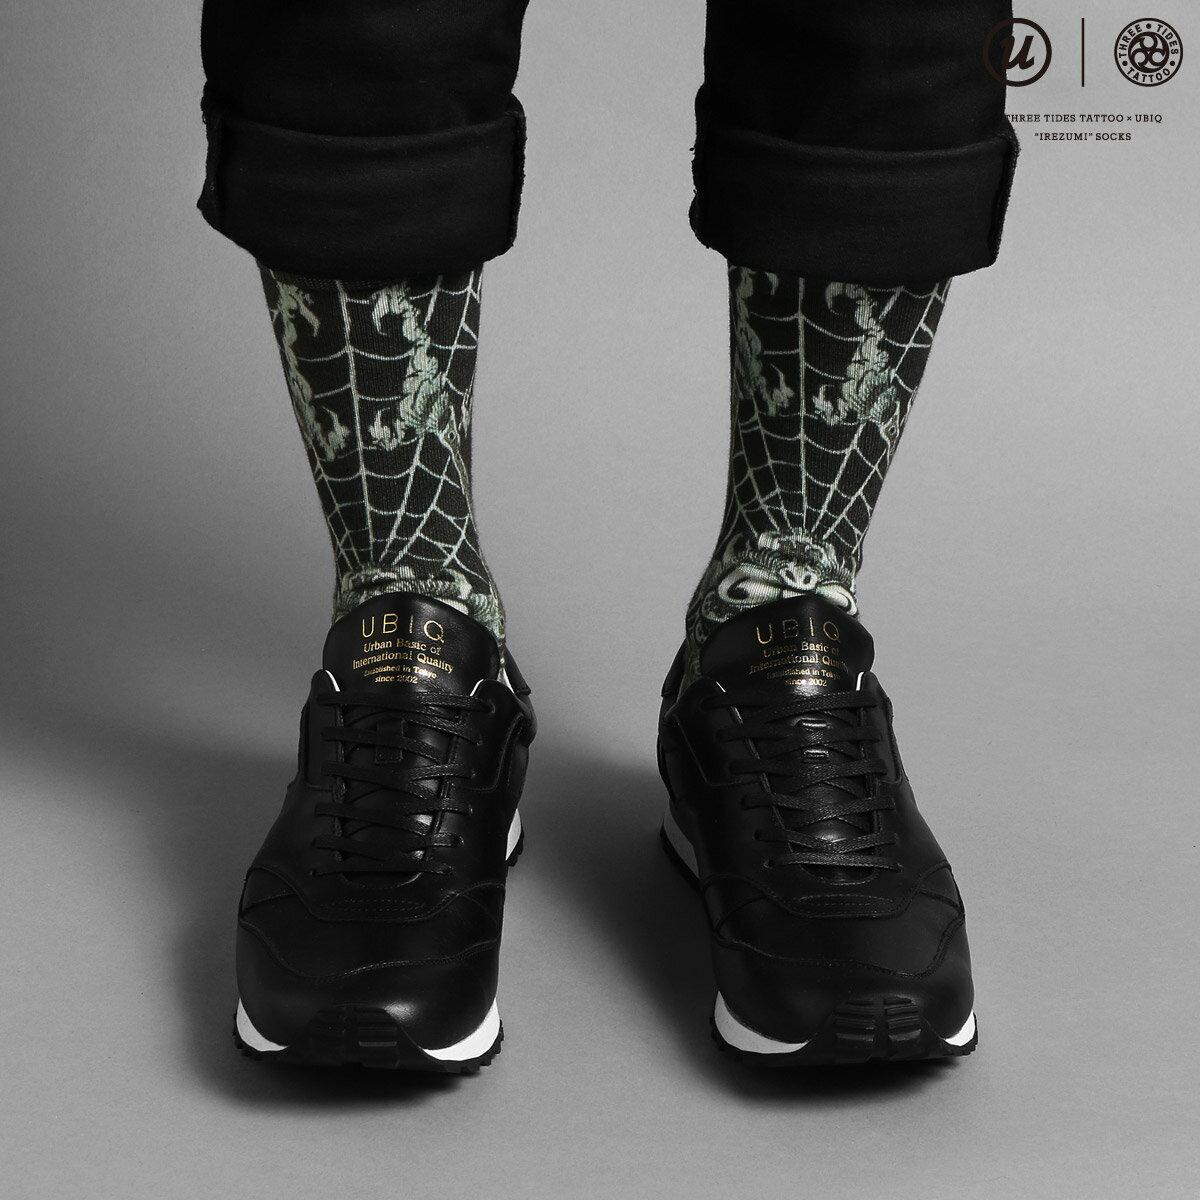 "UBIQ THREE TIDES TATTOO × UBIQ ""IREZUMI"" SOCKS (Dokugumo) Designed by Ganji (スリータイズタトゥー ユービック イレズミソックス (ドクグモ) デザインド バイ ガンジー) (BLACK)【メンズ 靴下】17SS-I"